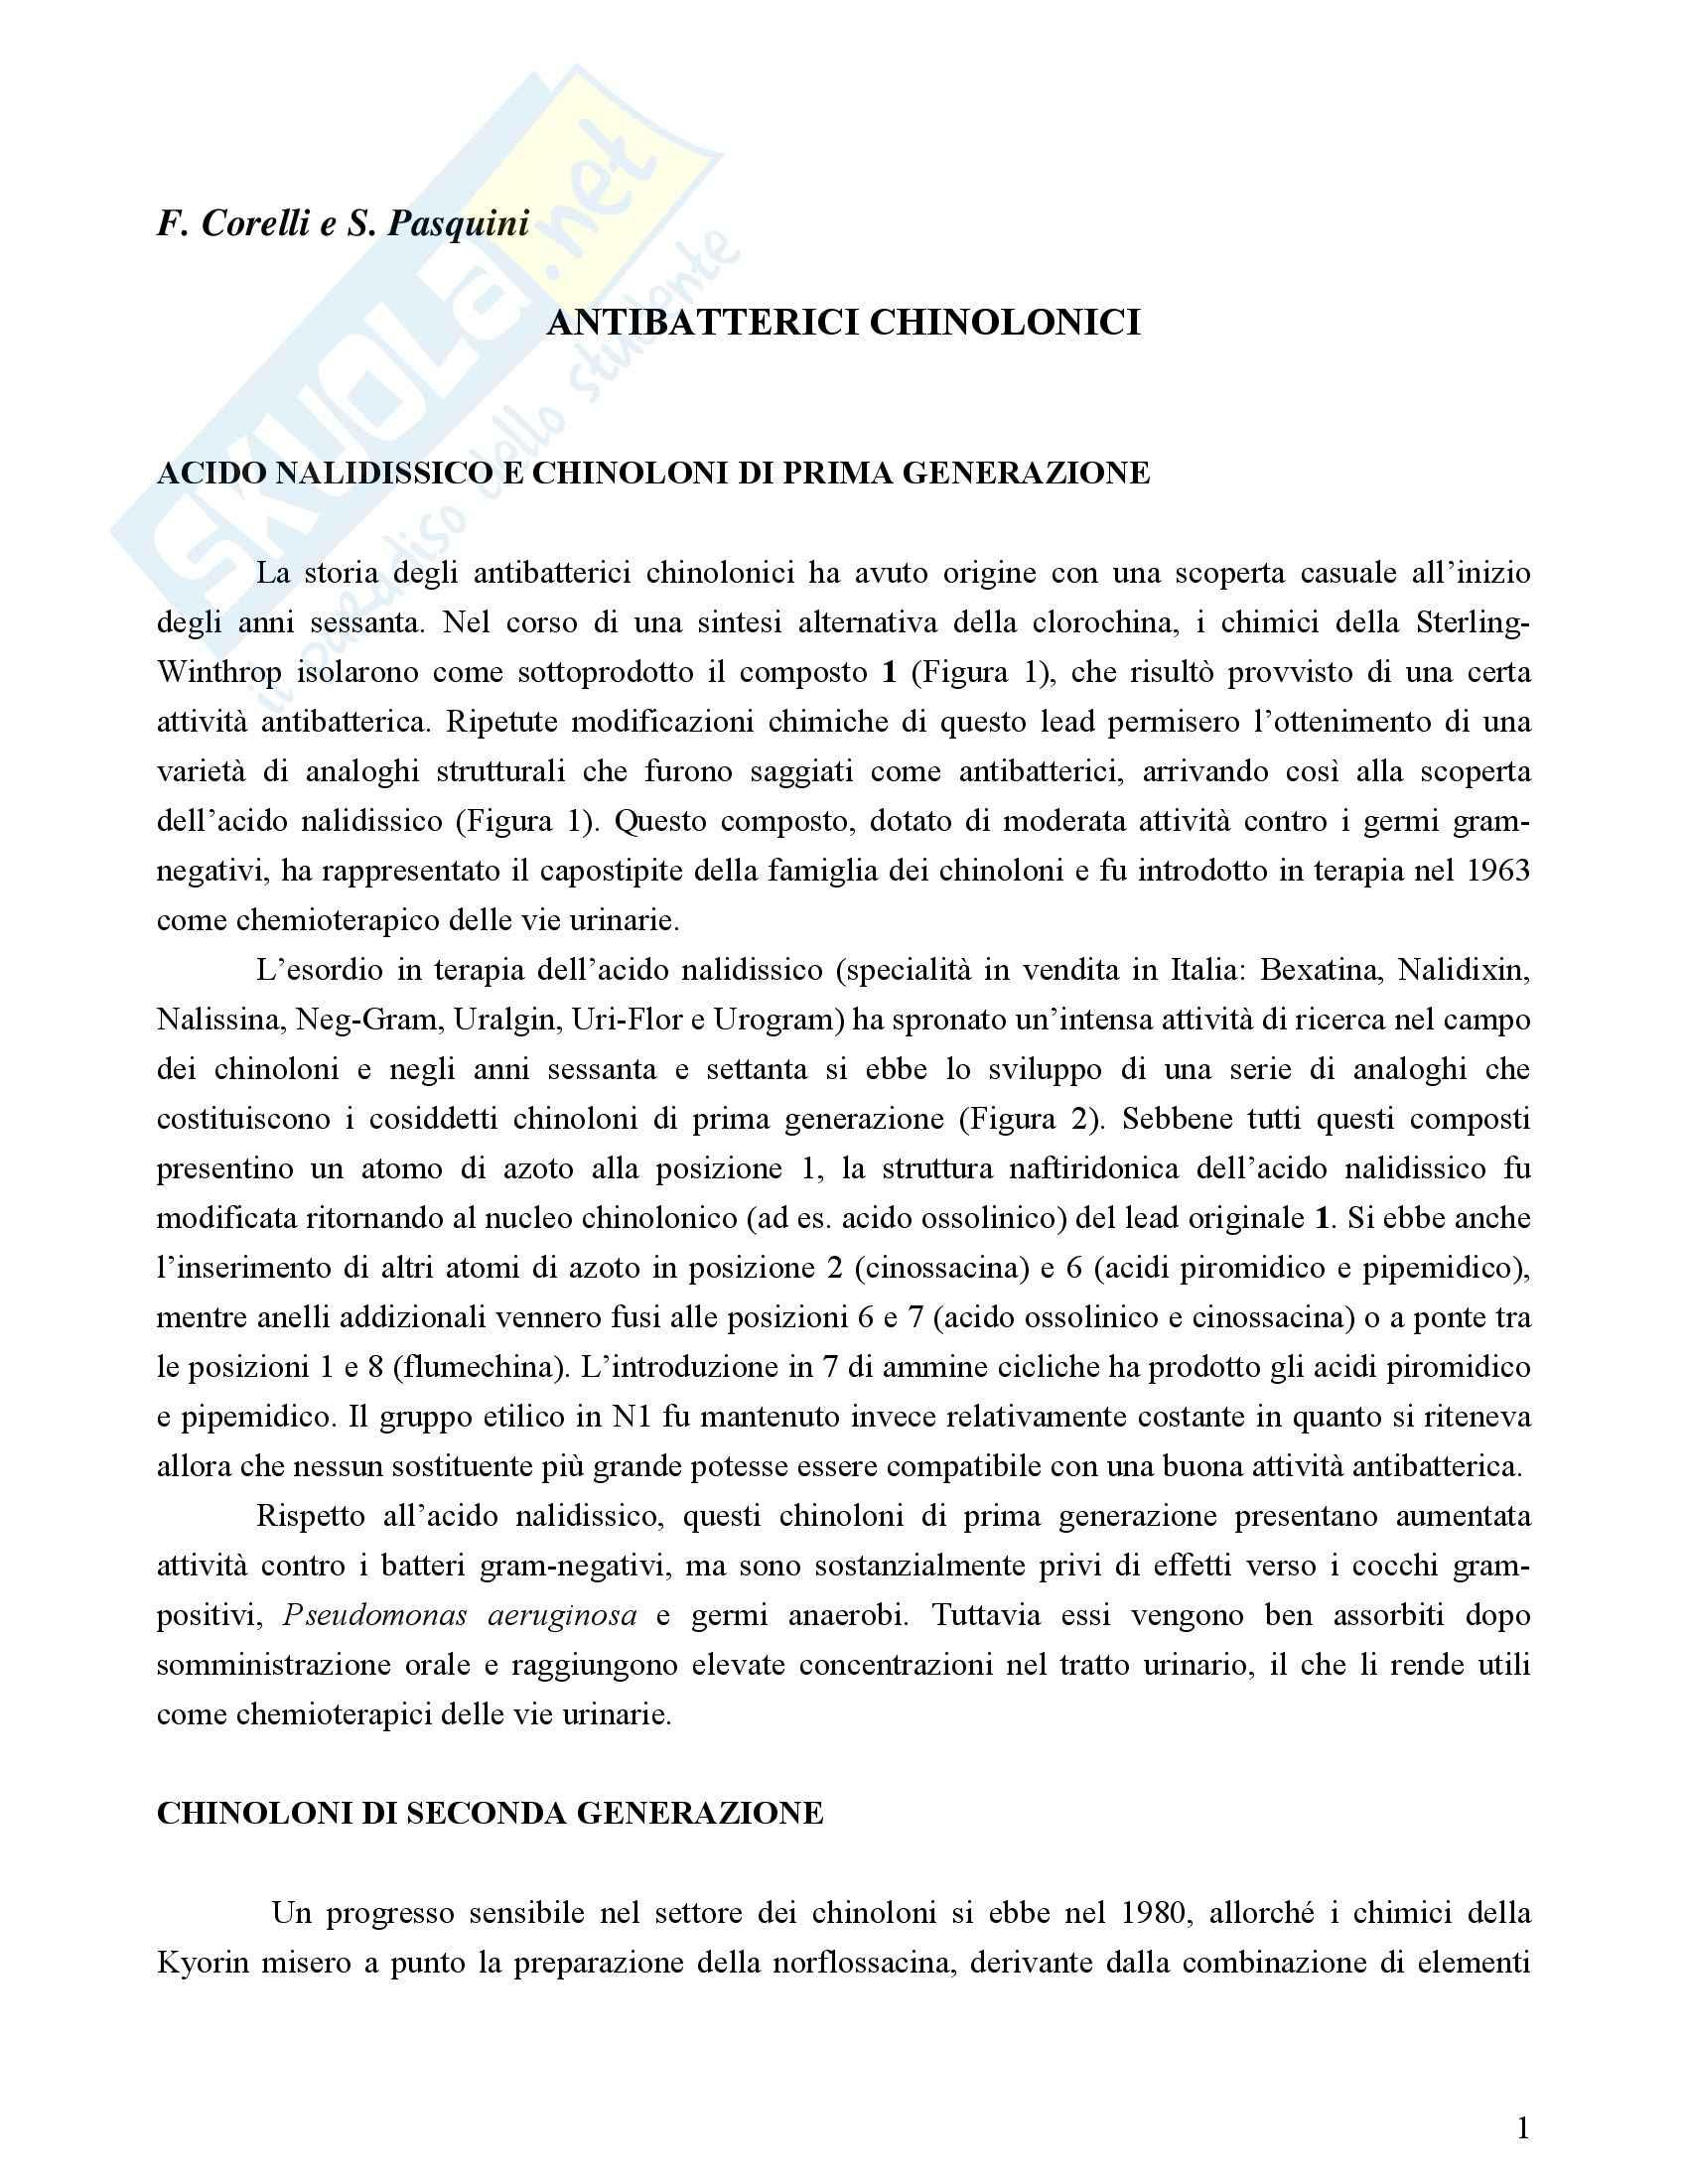 Chimica farmaceutica - antibatterici chinolonici